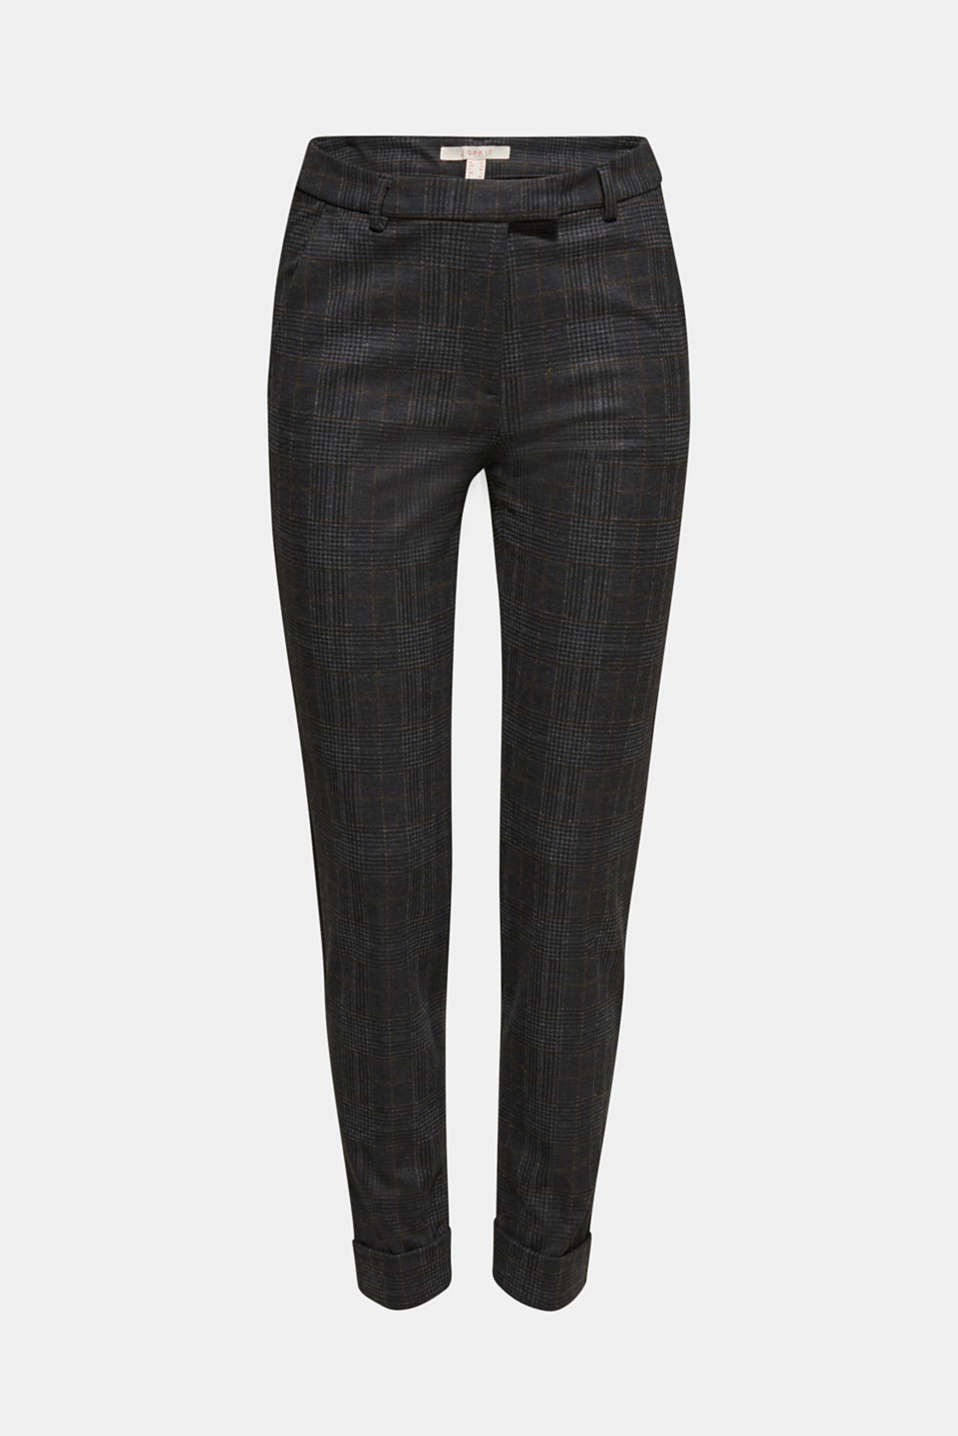 Pants woven, CINNAMON, detail image number 7